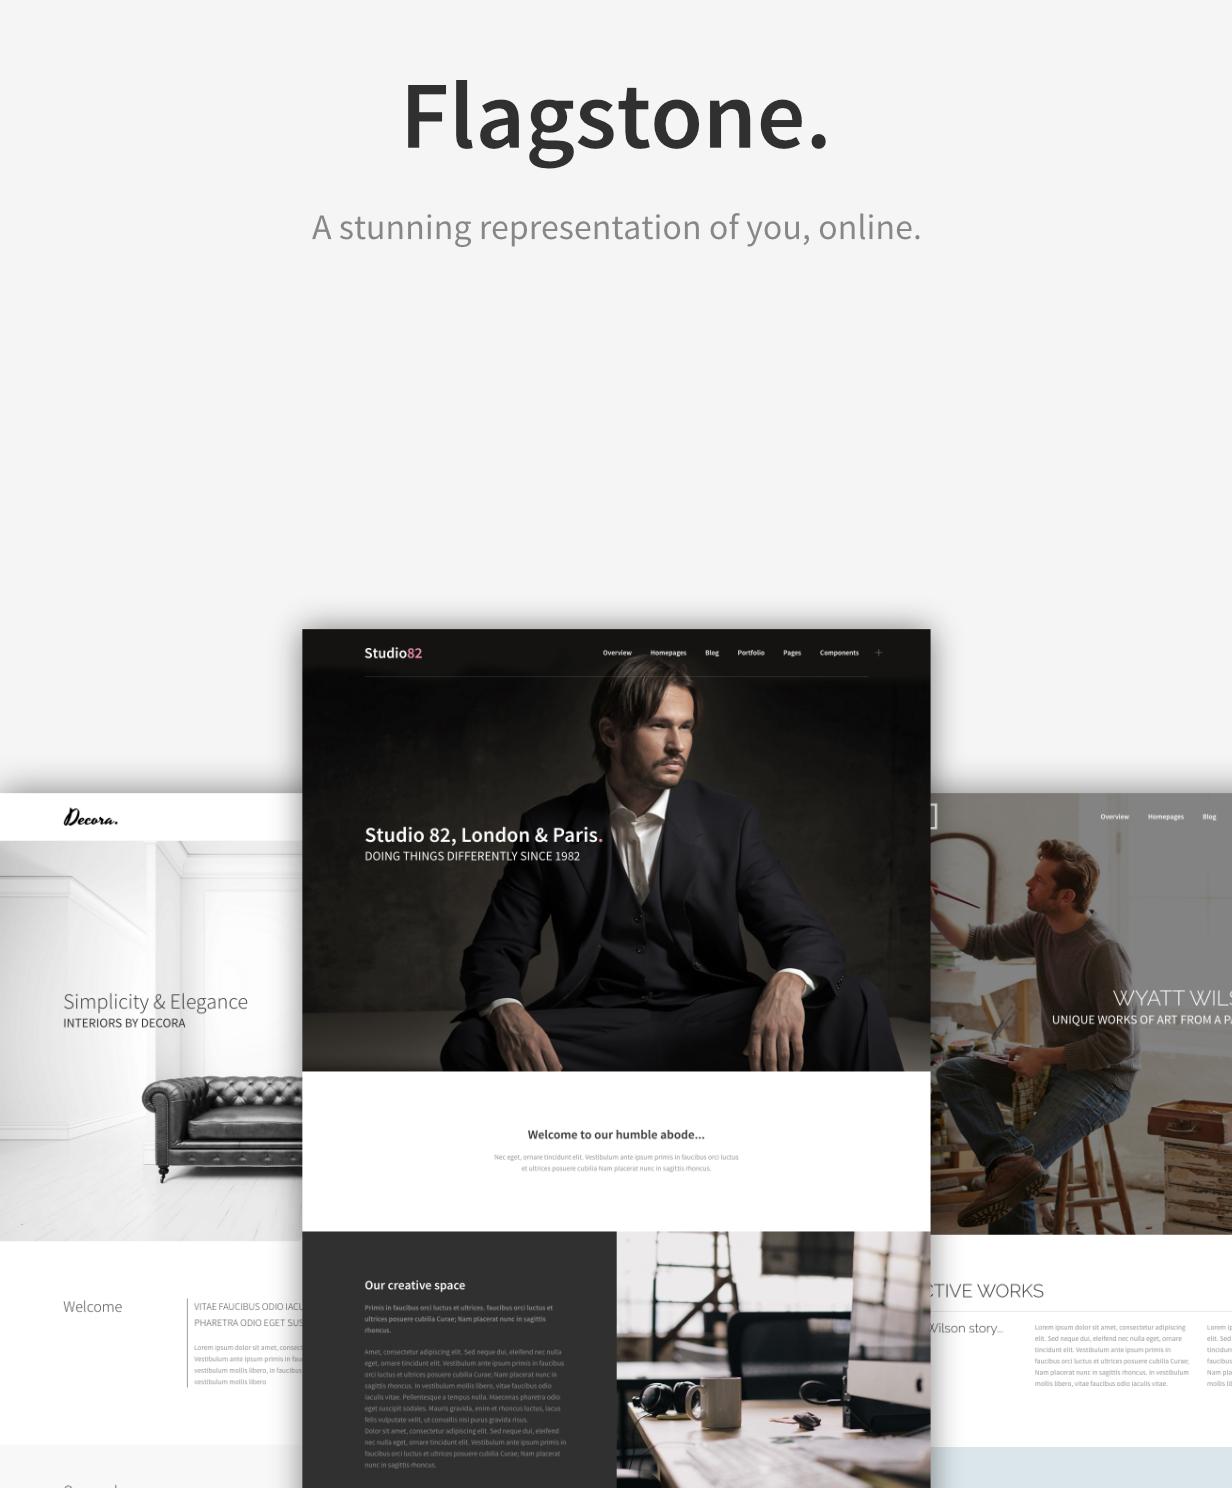 Flagstone promo image